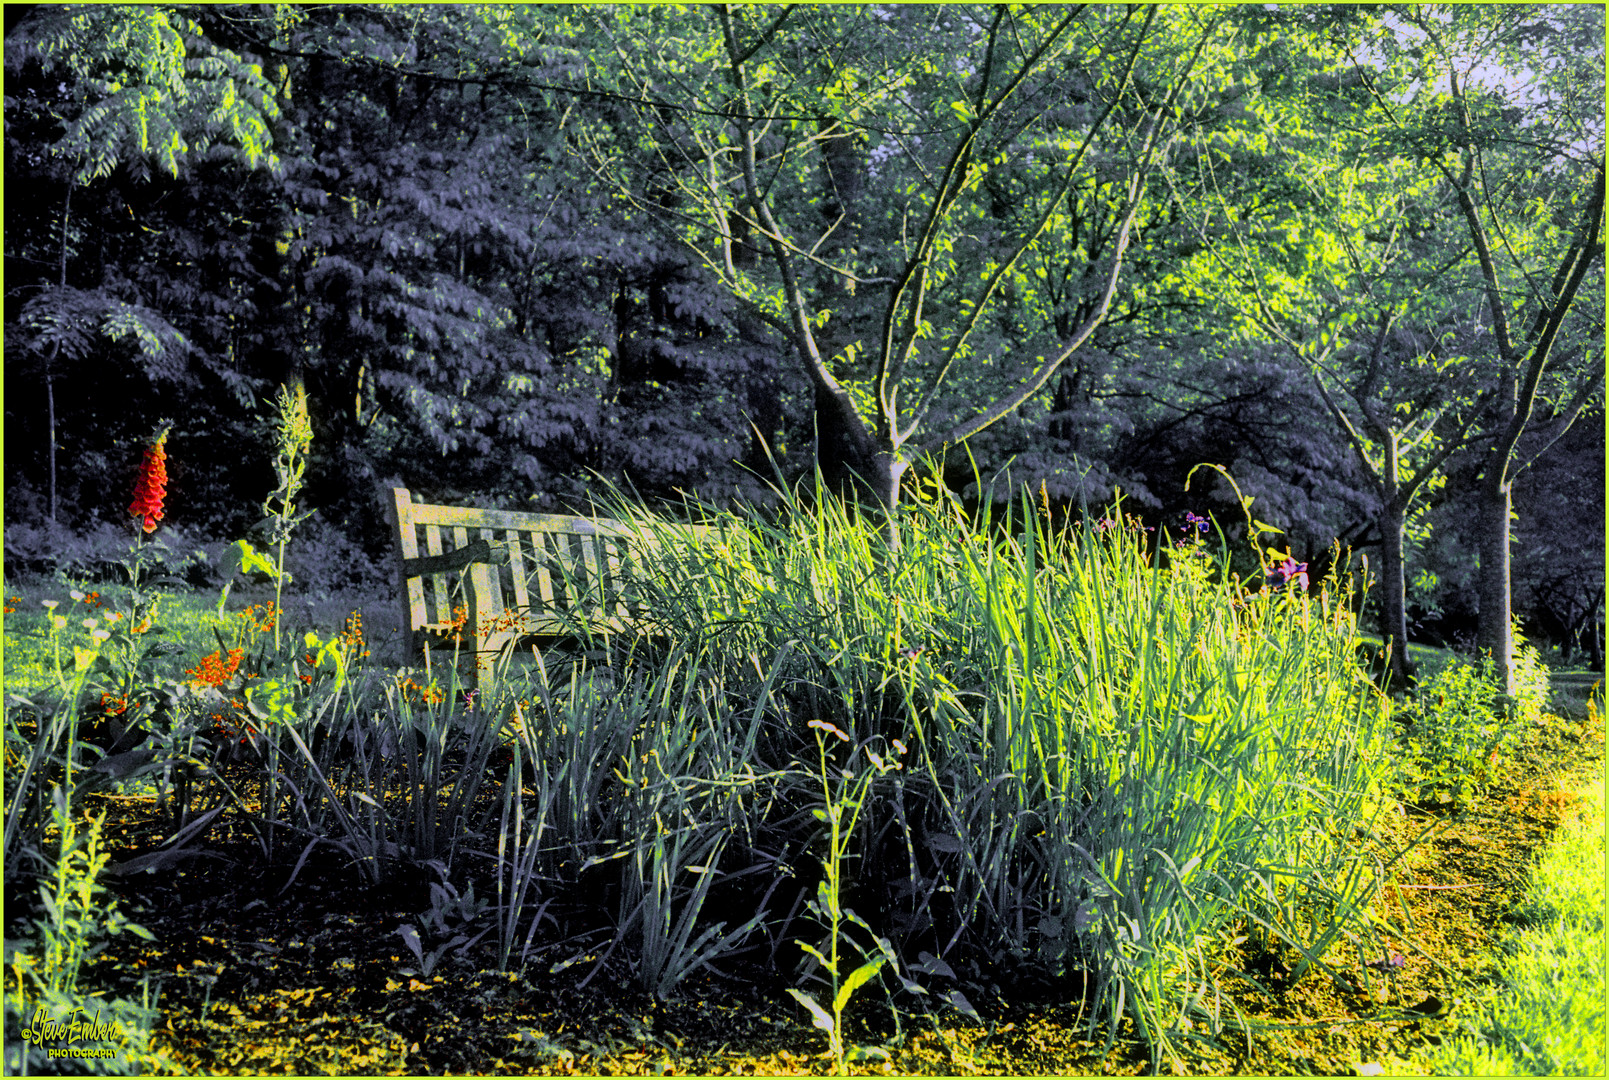 On a Springtime Stroll through Meadowlark Gardens